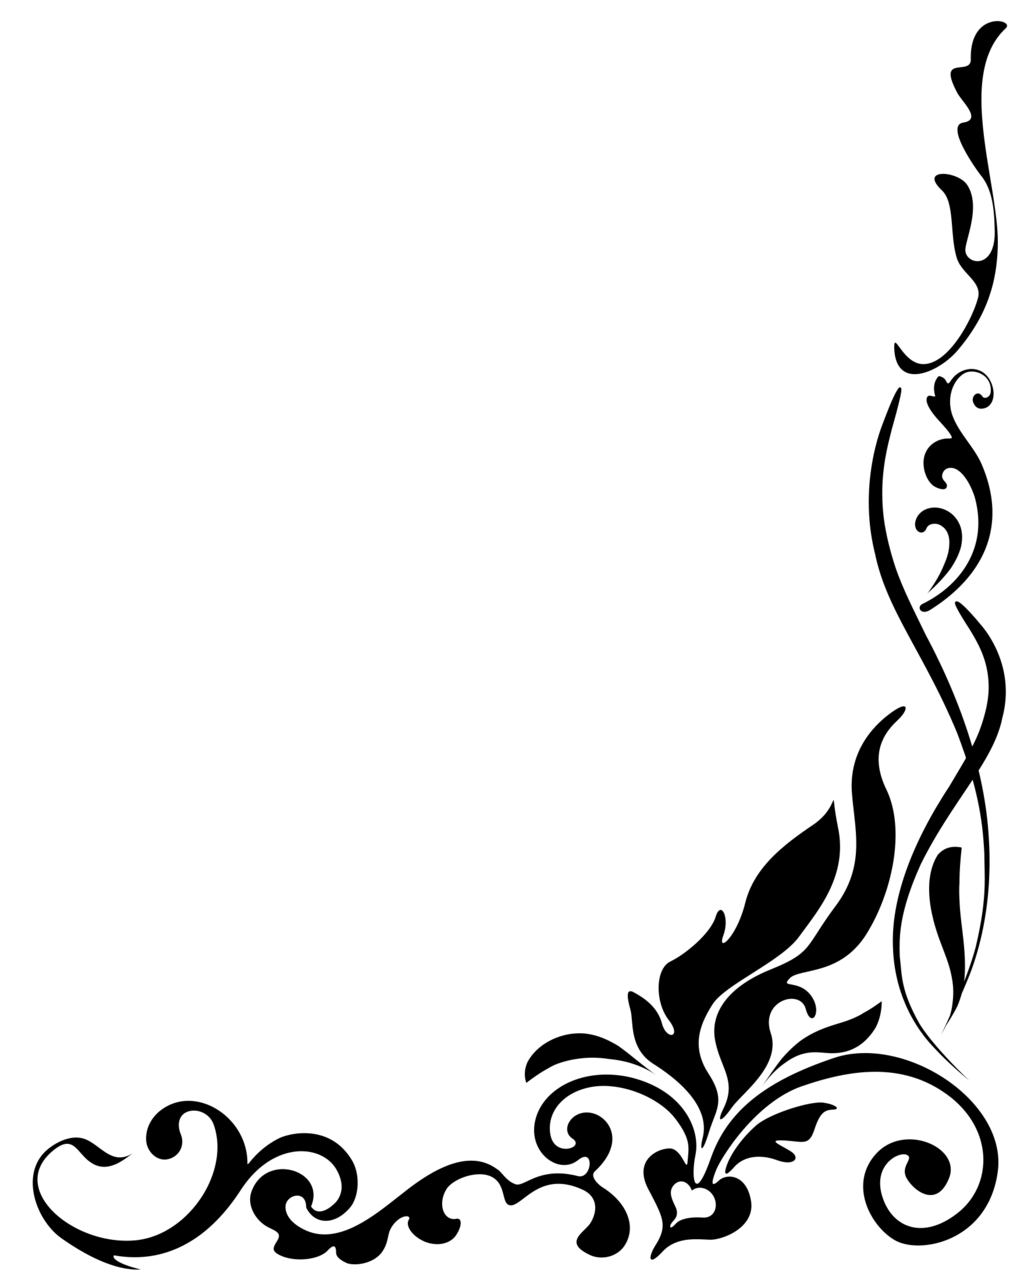 Funeral clipart black and white. Ornamental single line border